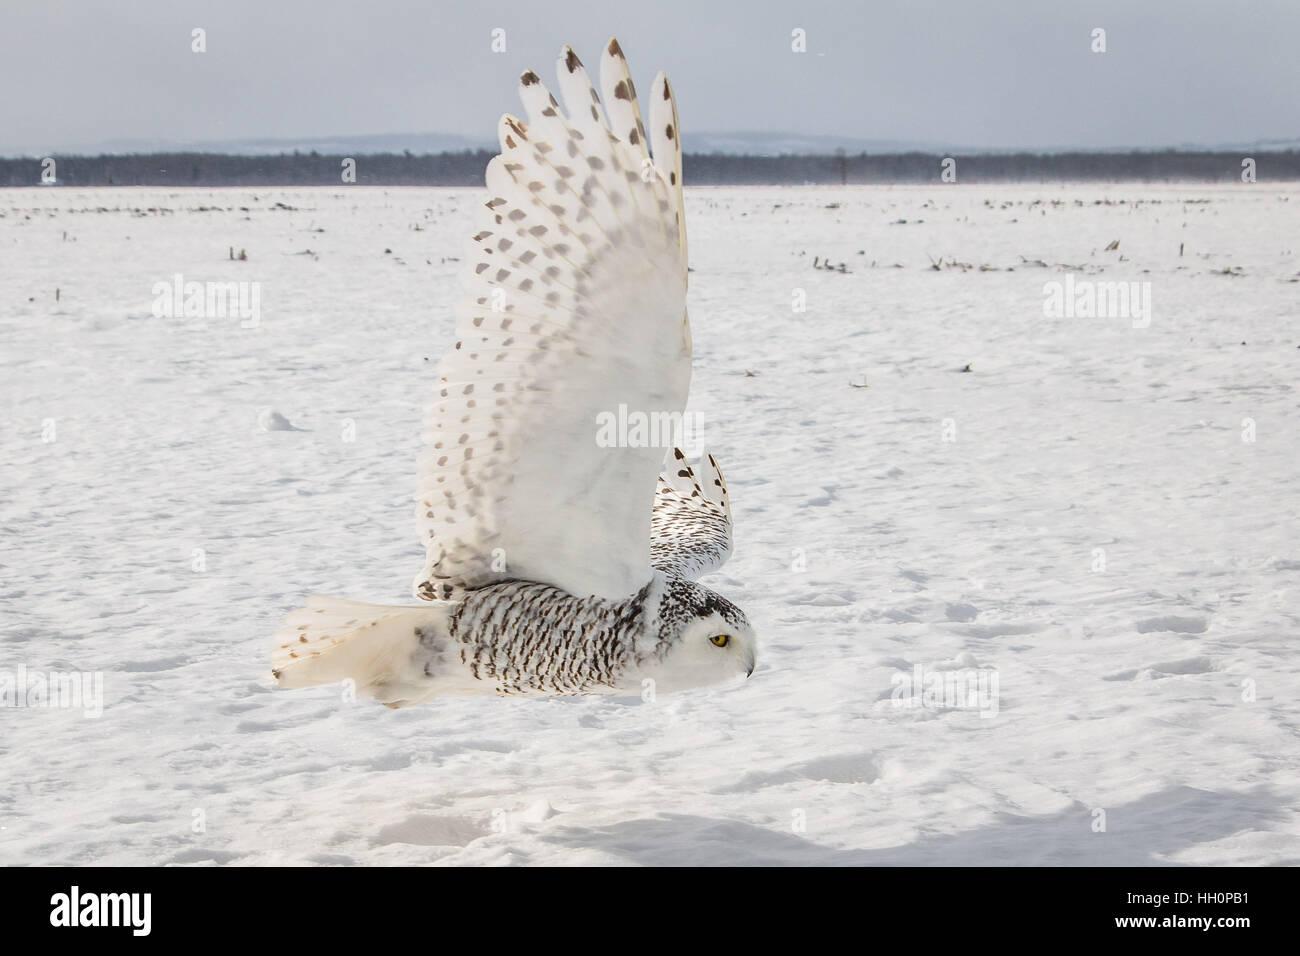 Snowy Owl, Stayner, Ontario, Canada 2017 - Stock Image